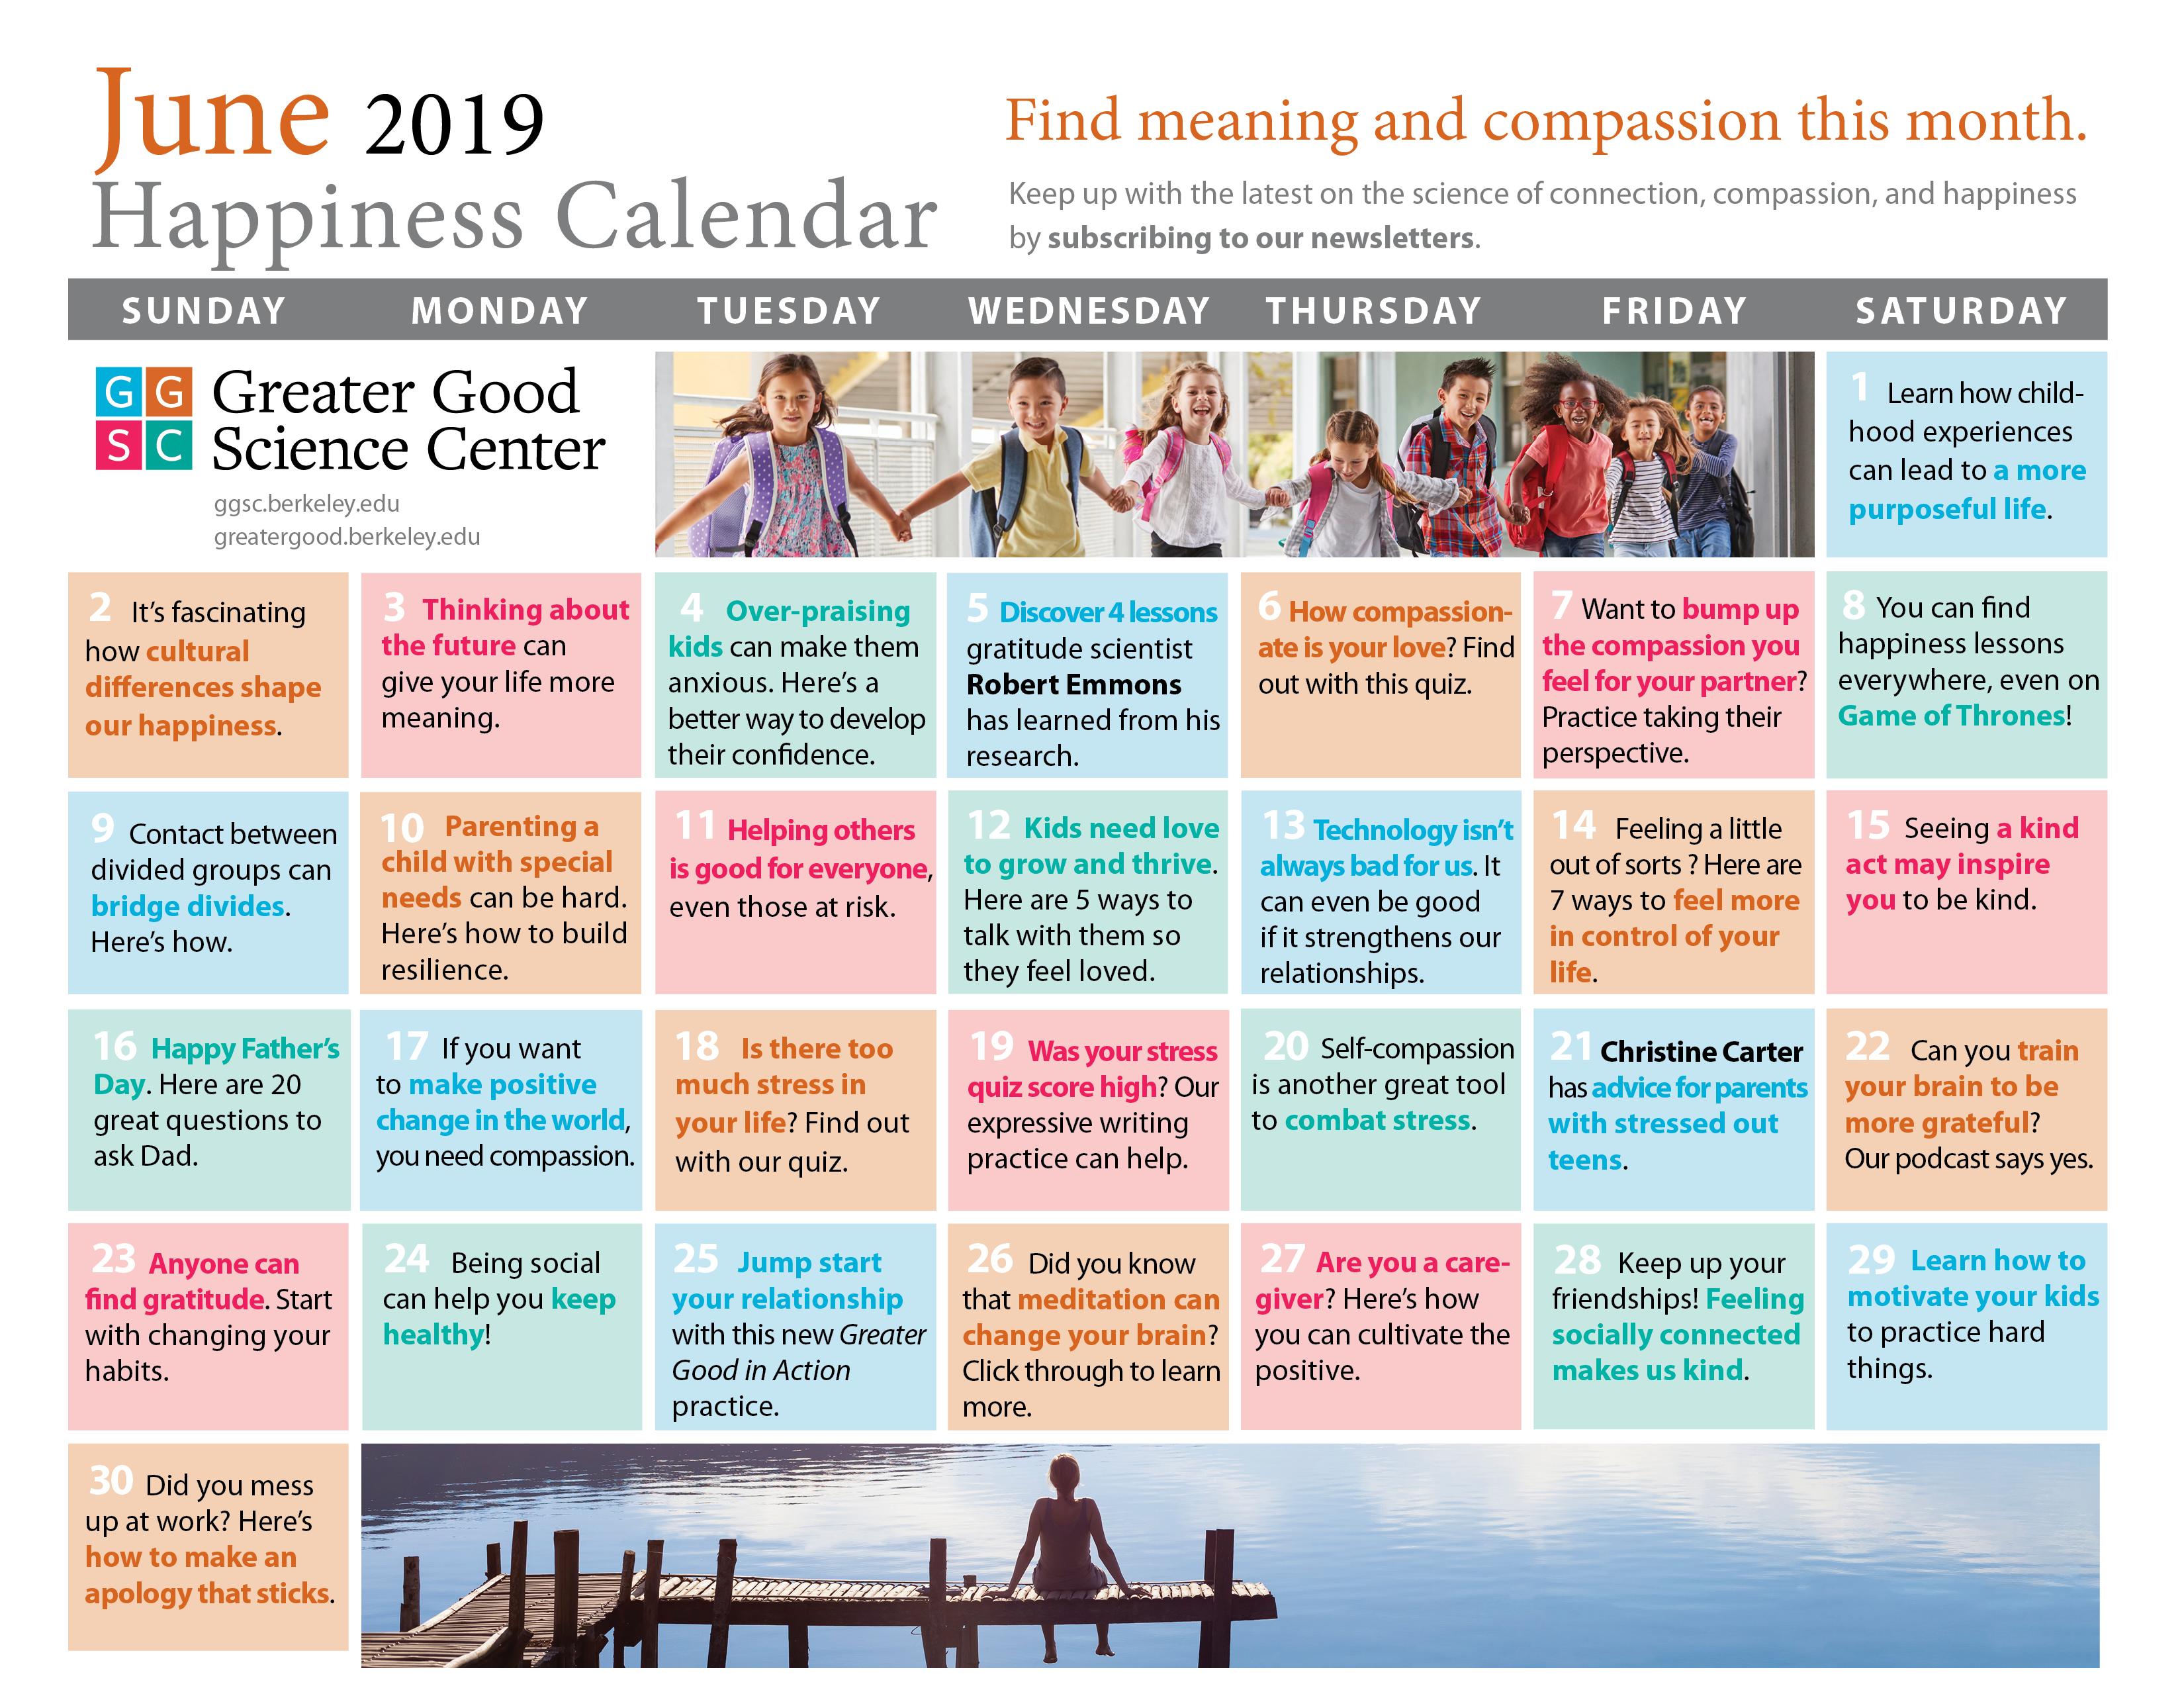 June 2019 Happiness Calendar